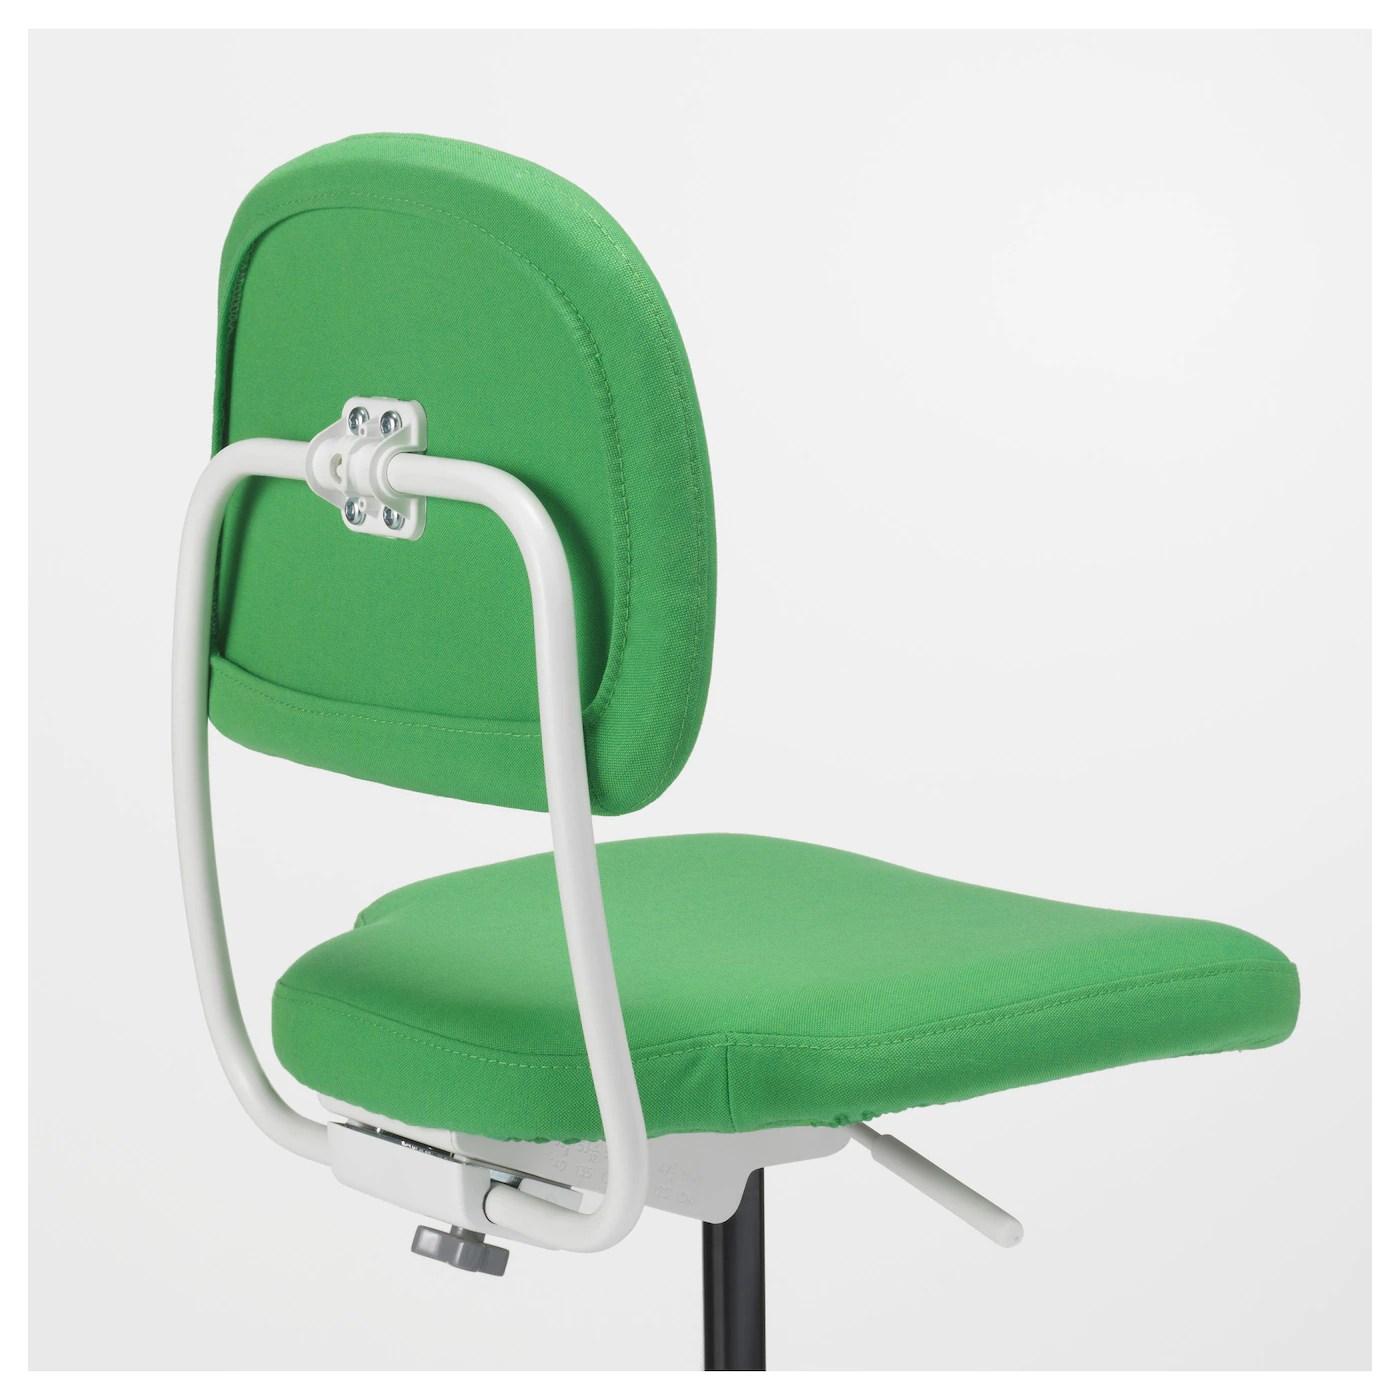 green computer chair large reading vimund children 39s desk vissle bright ikea